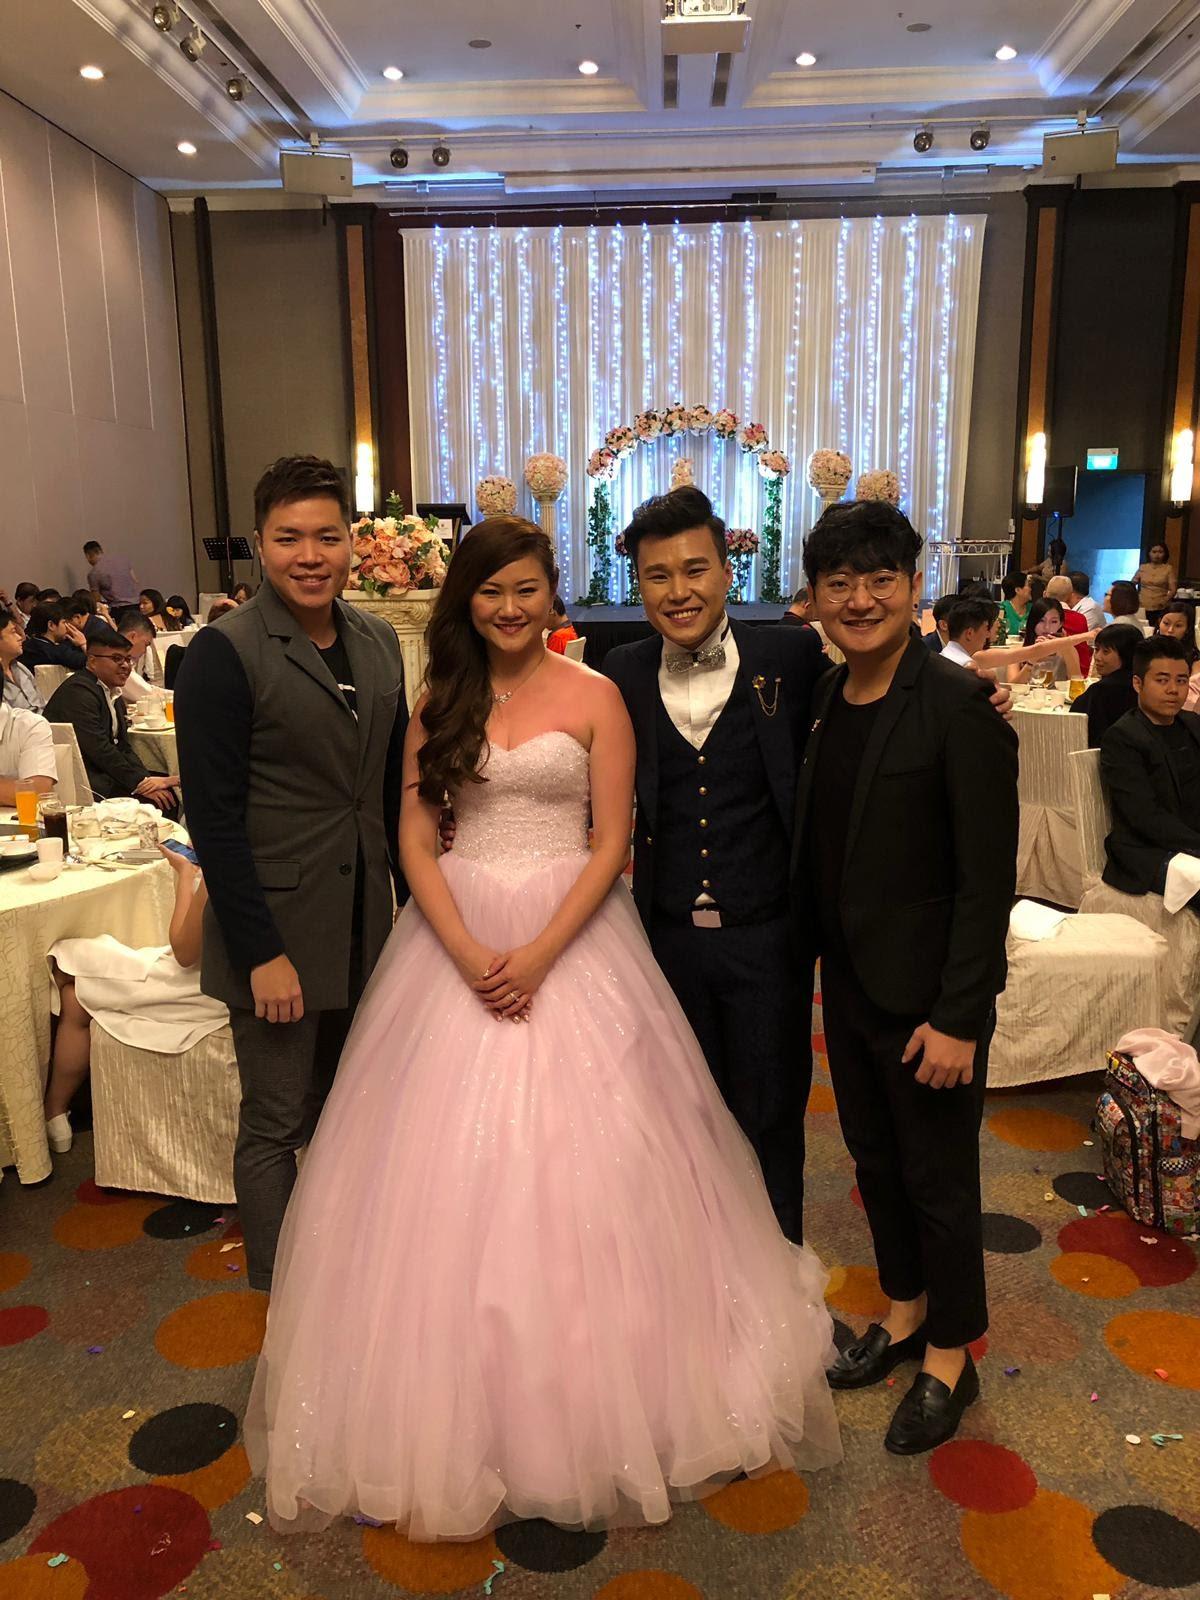 Orchard Hotel Wedding Live Band MC Emcee